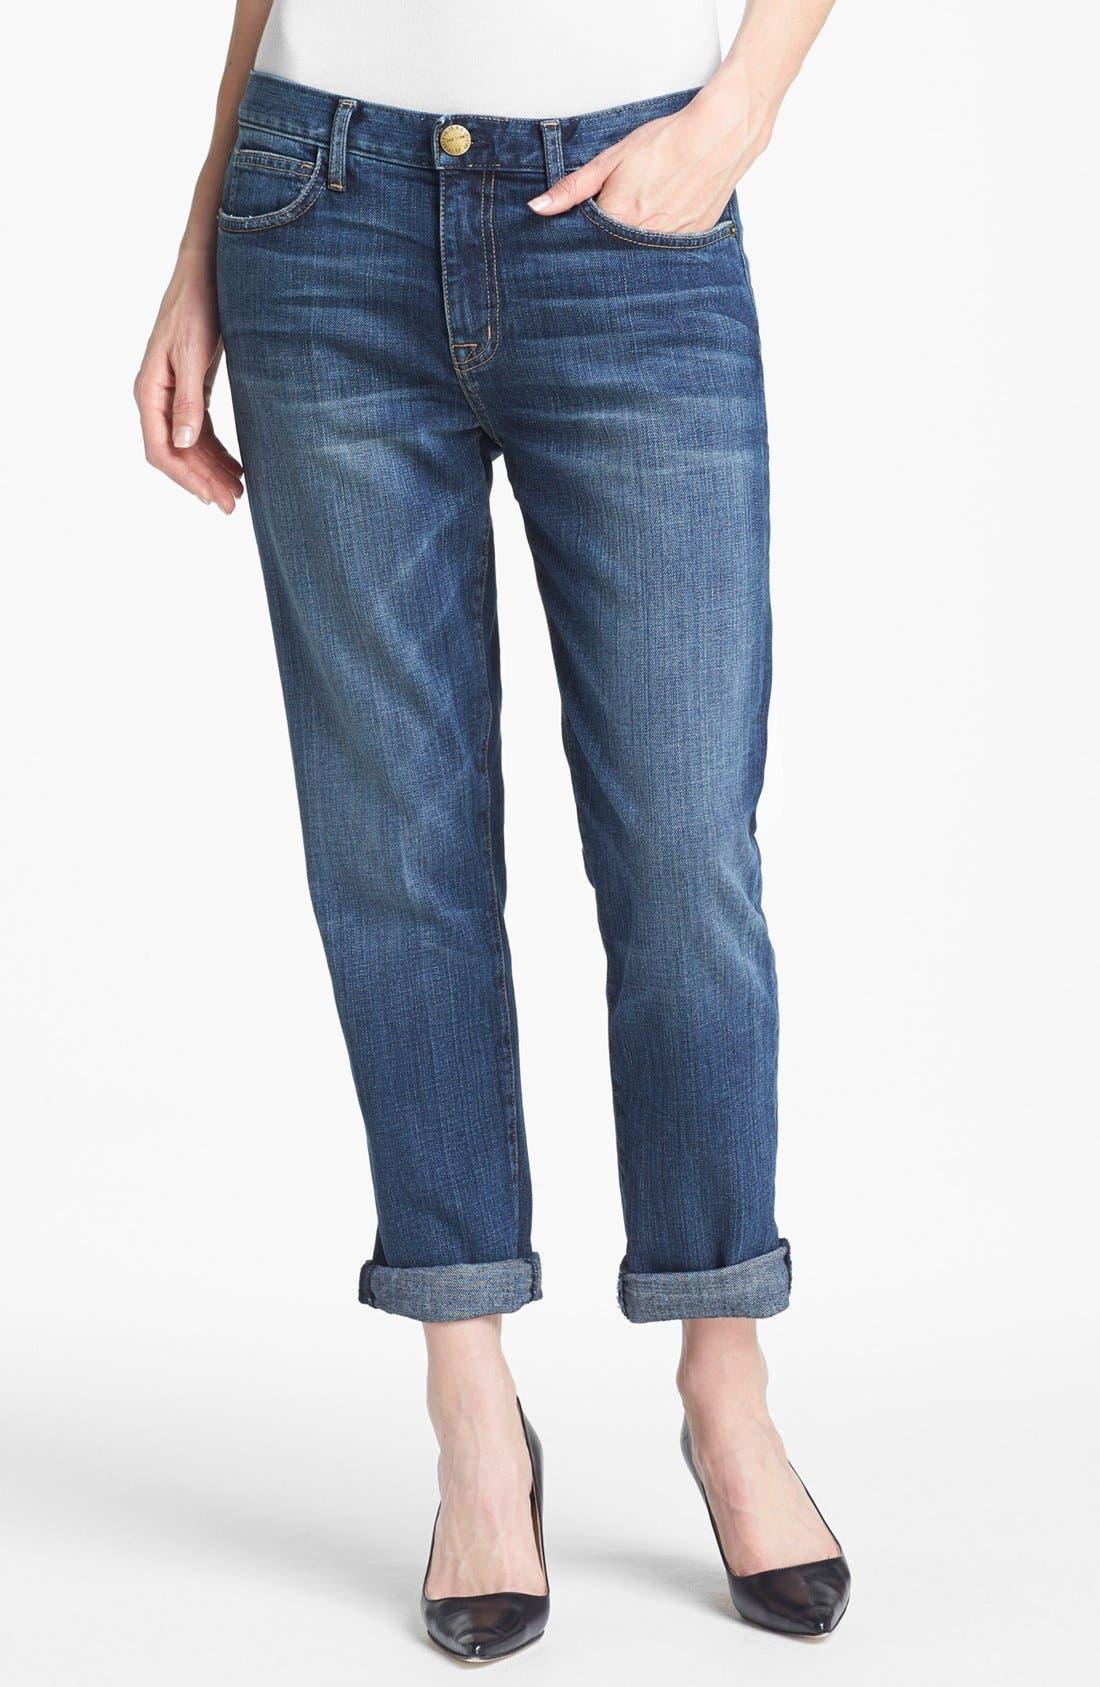 Alternate Image 1 Selected - Current/Elliott 'The Fling' Rolled Jeans (Loved)